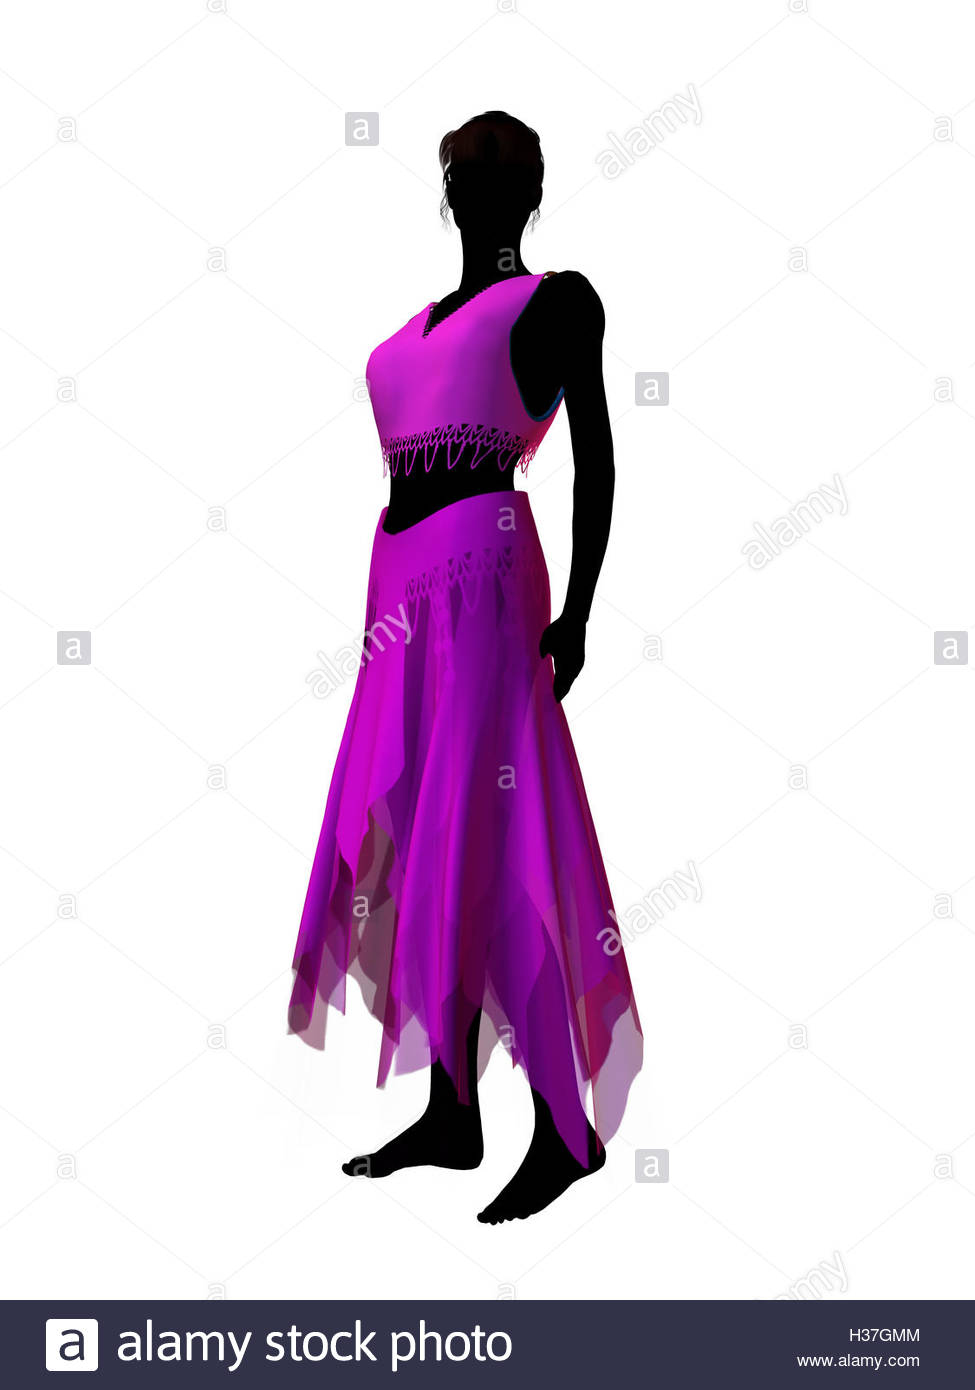 975x1390 Jasmine Silhouette Illustration Stock Photo 122483332